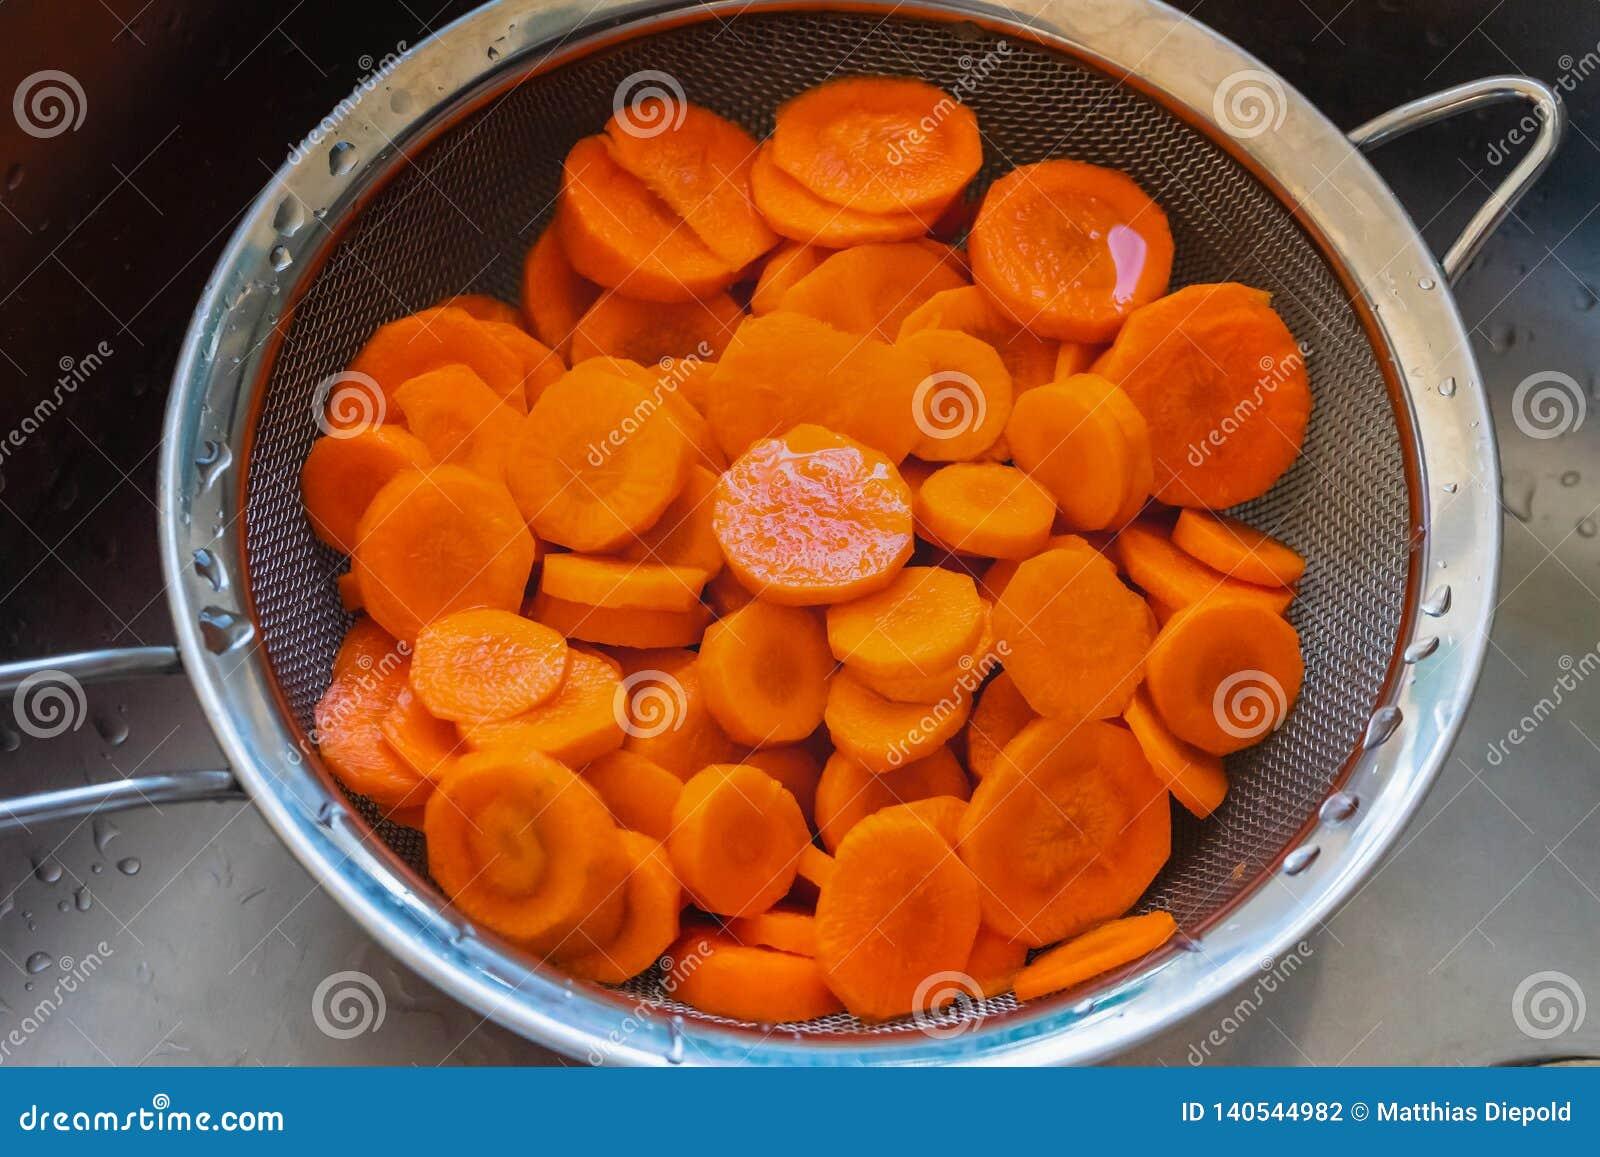 Carrots cut in a sieve